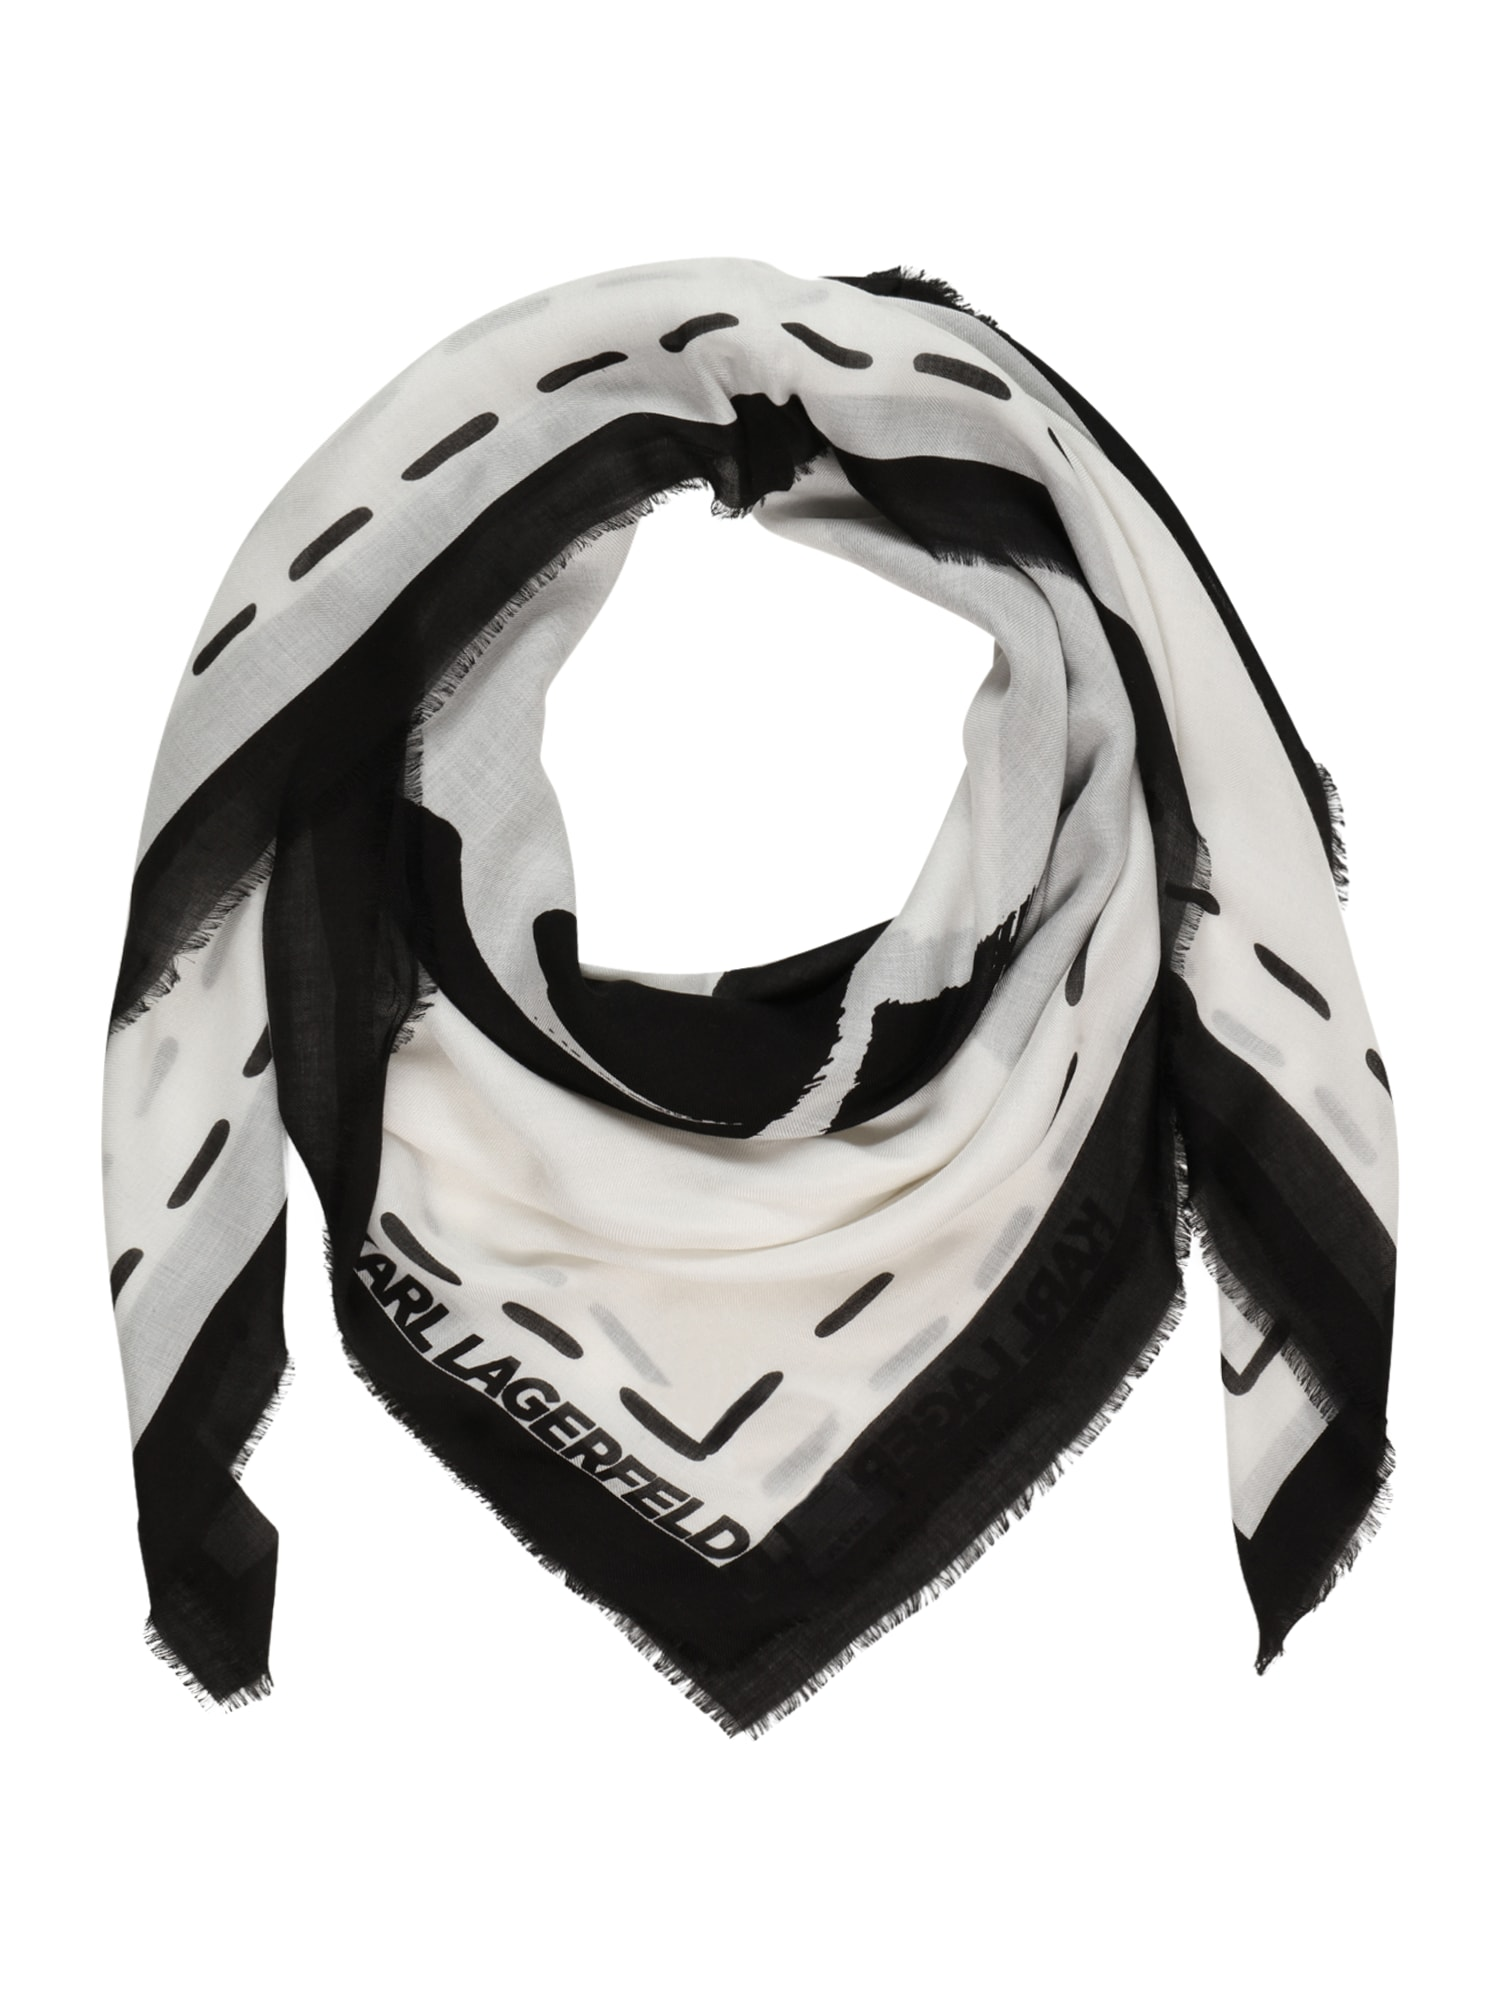 Karl Lagerfeld Skara juoda / balta